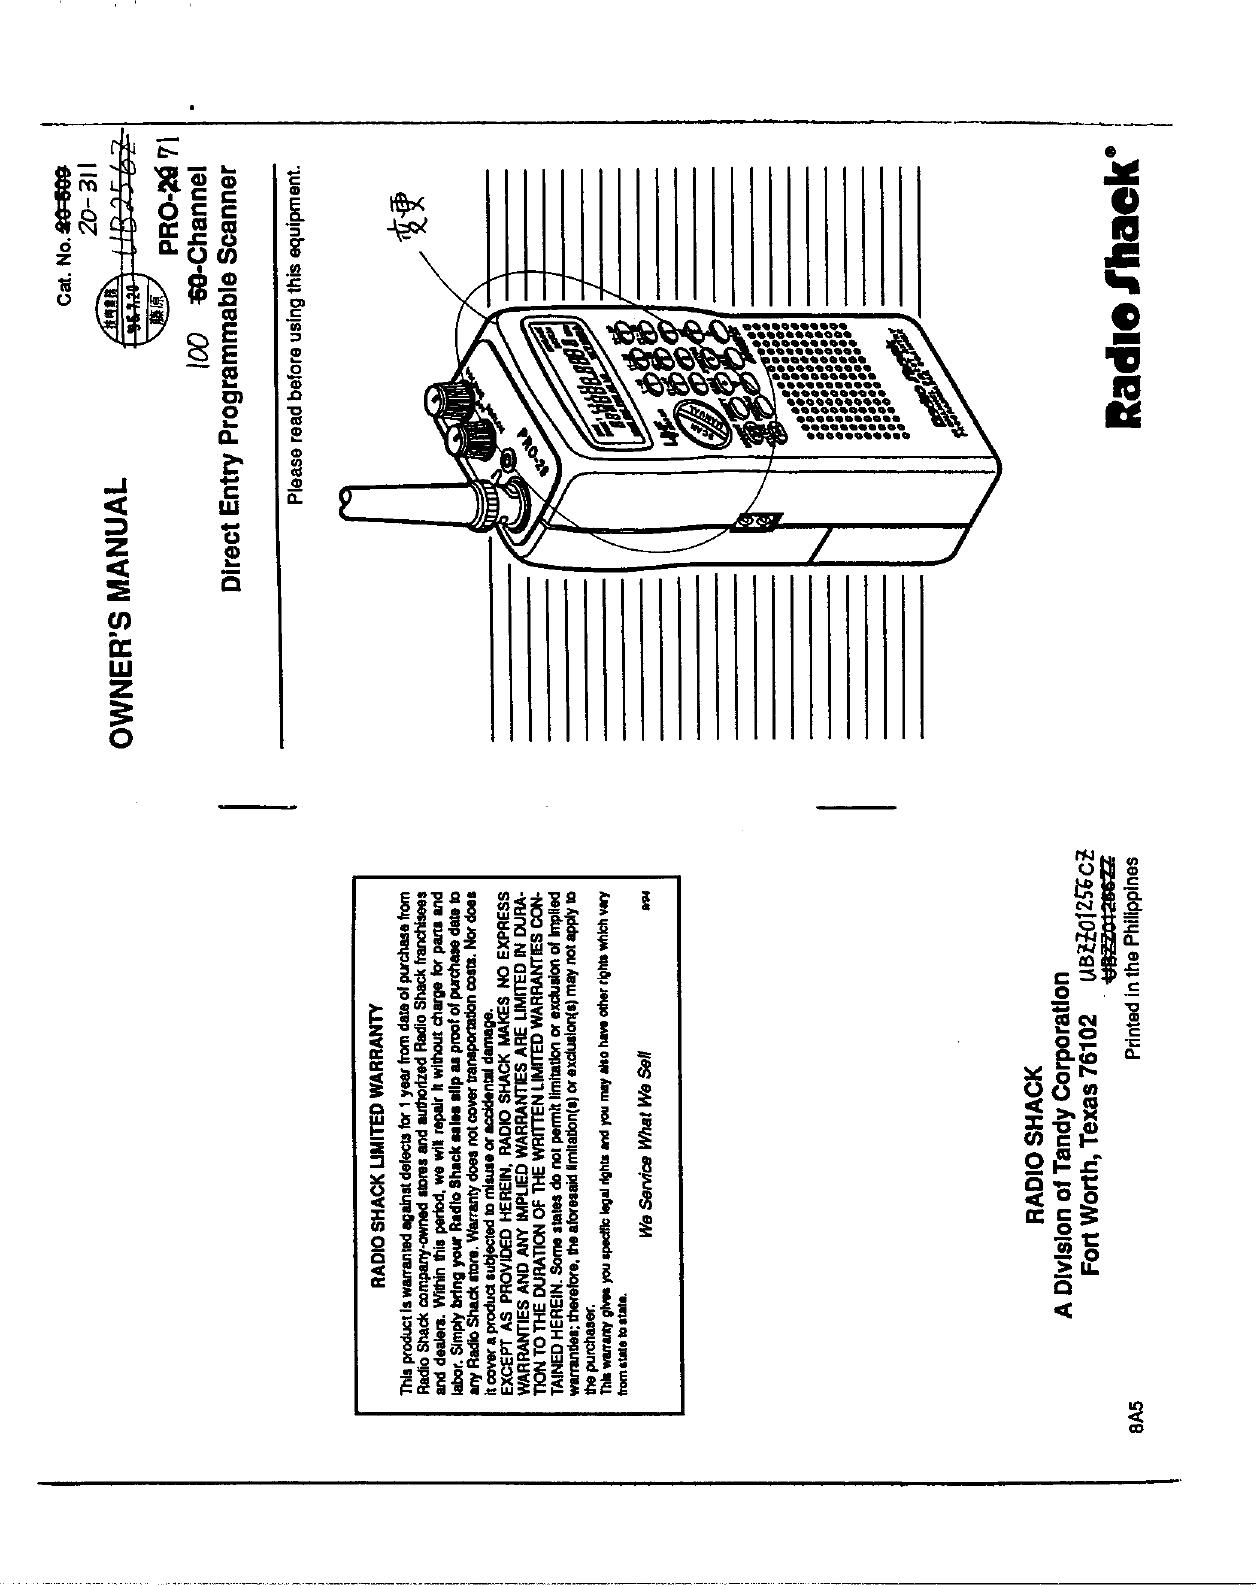 Radio Shack 20-311 User Manual 8